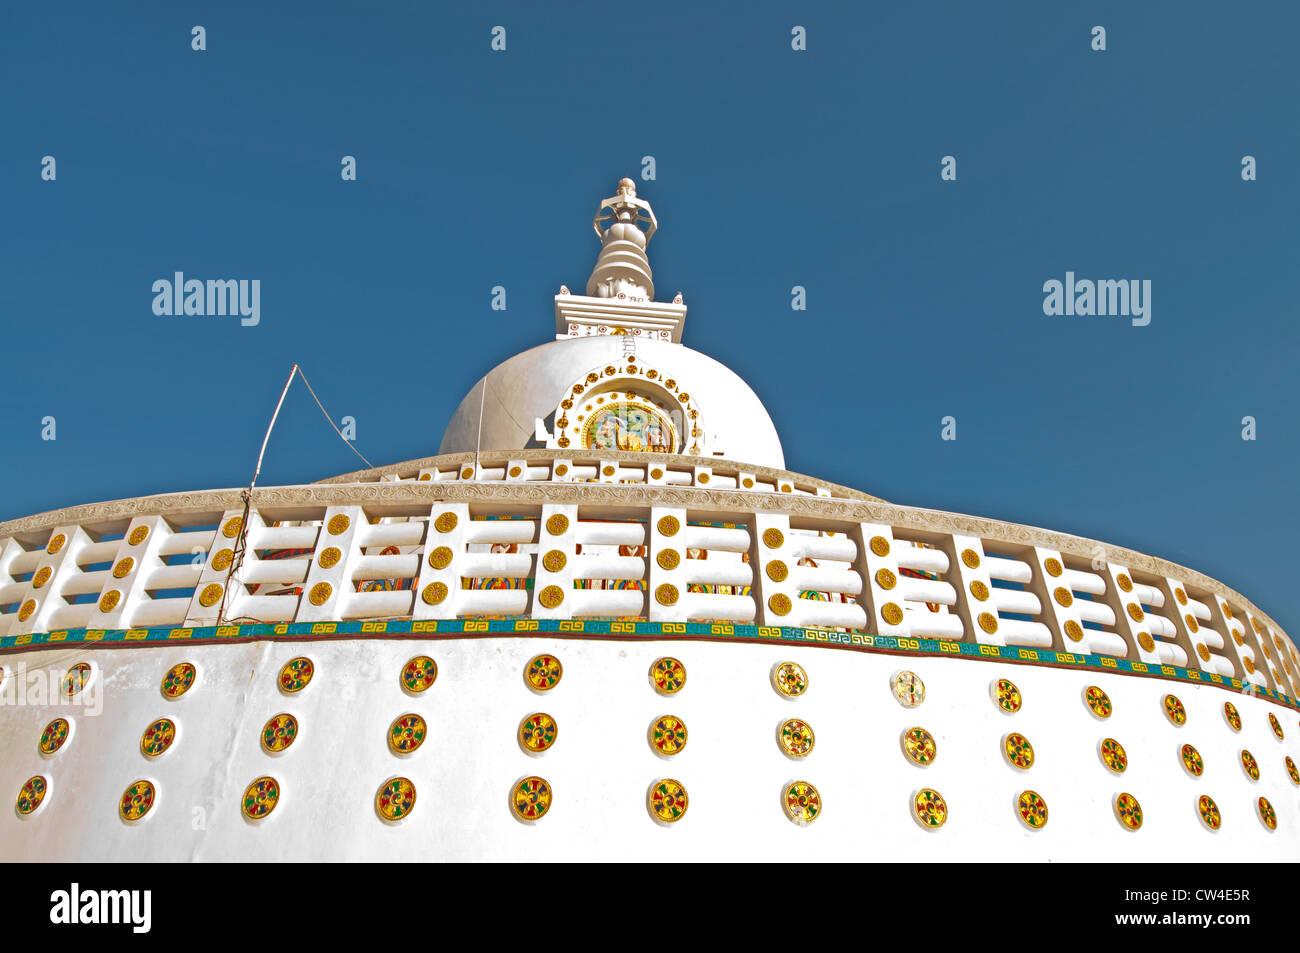 Shanti Stupa, a Buddhist white-domed stupa, or chorton, on a hilltop in Chanspa, Leh, Ladakh, India Stock Photo